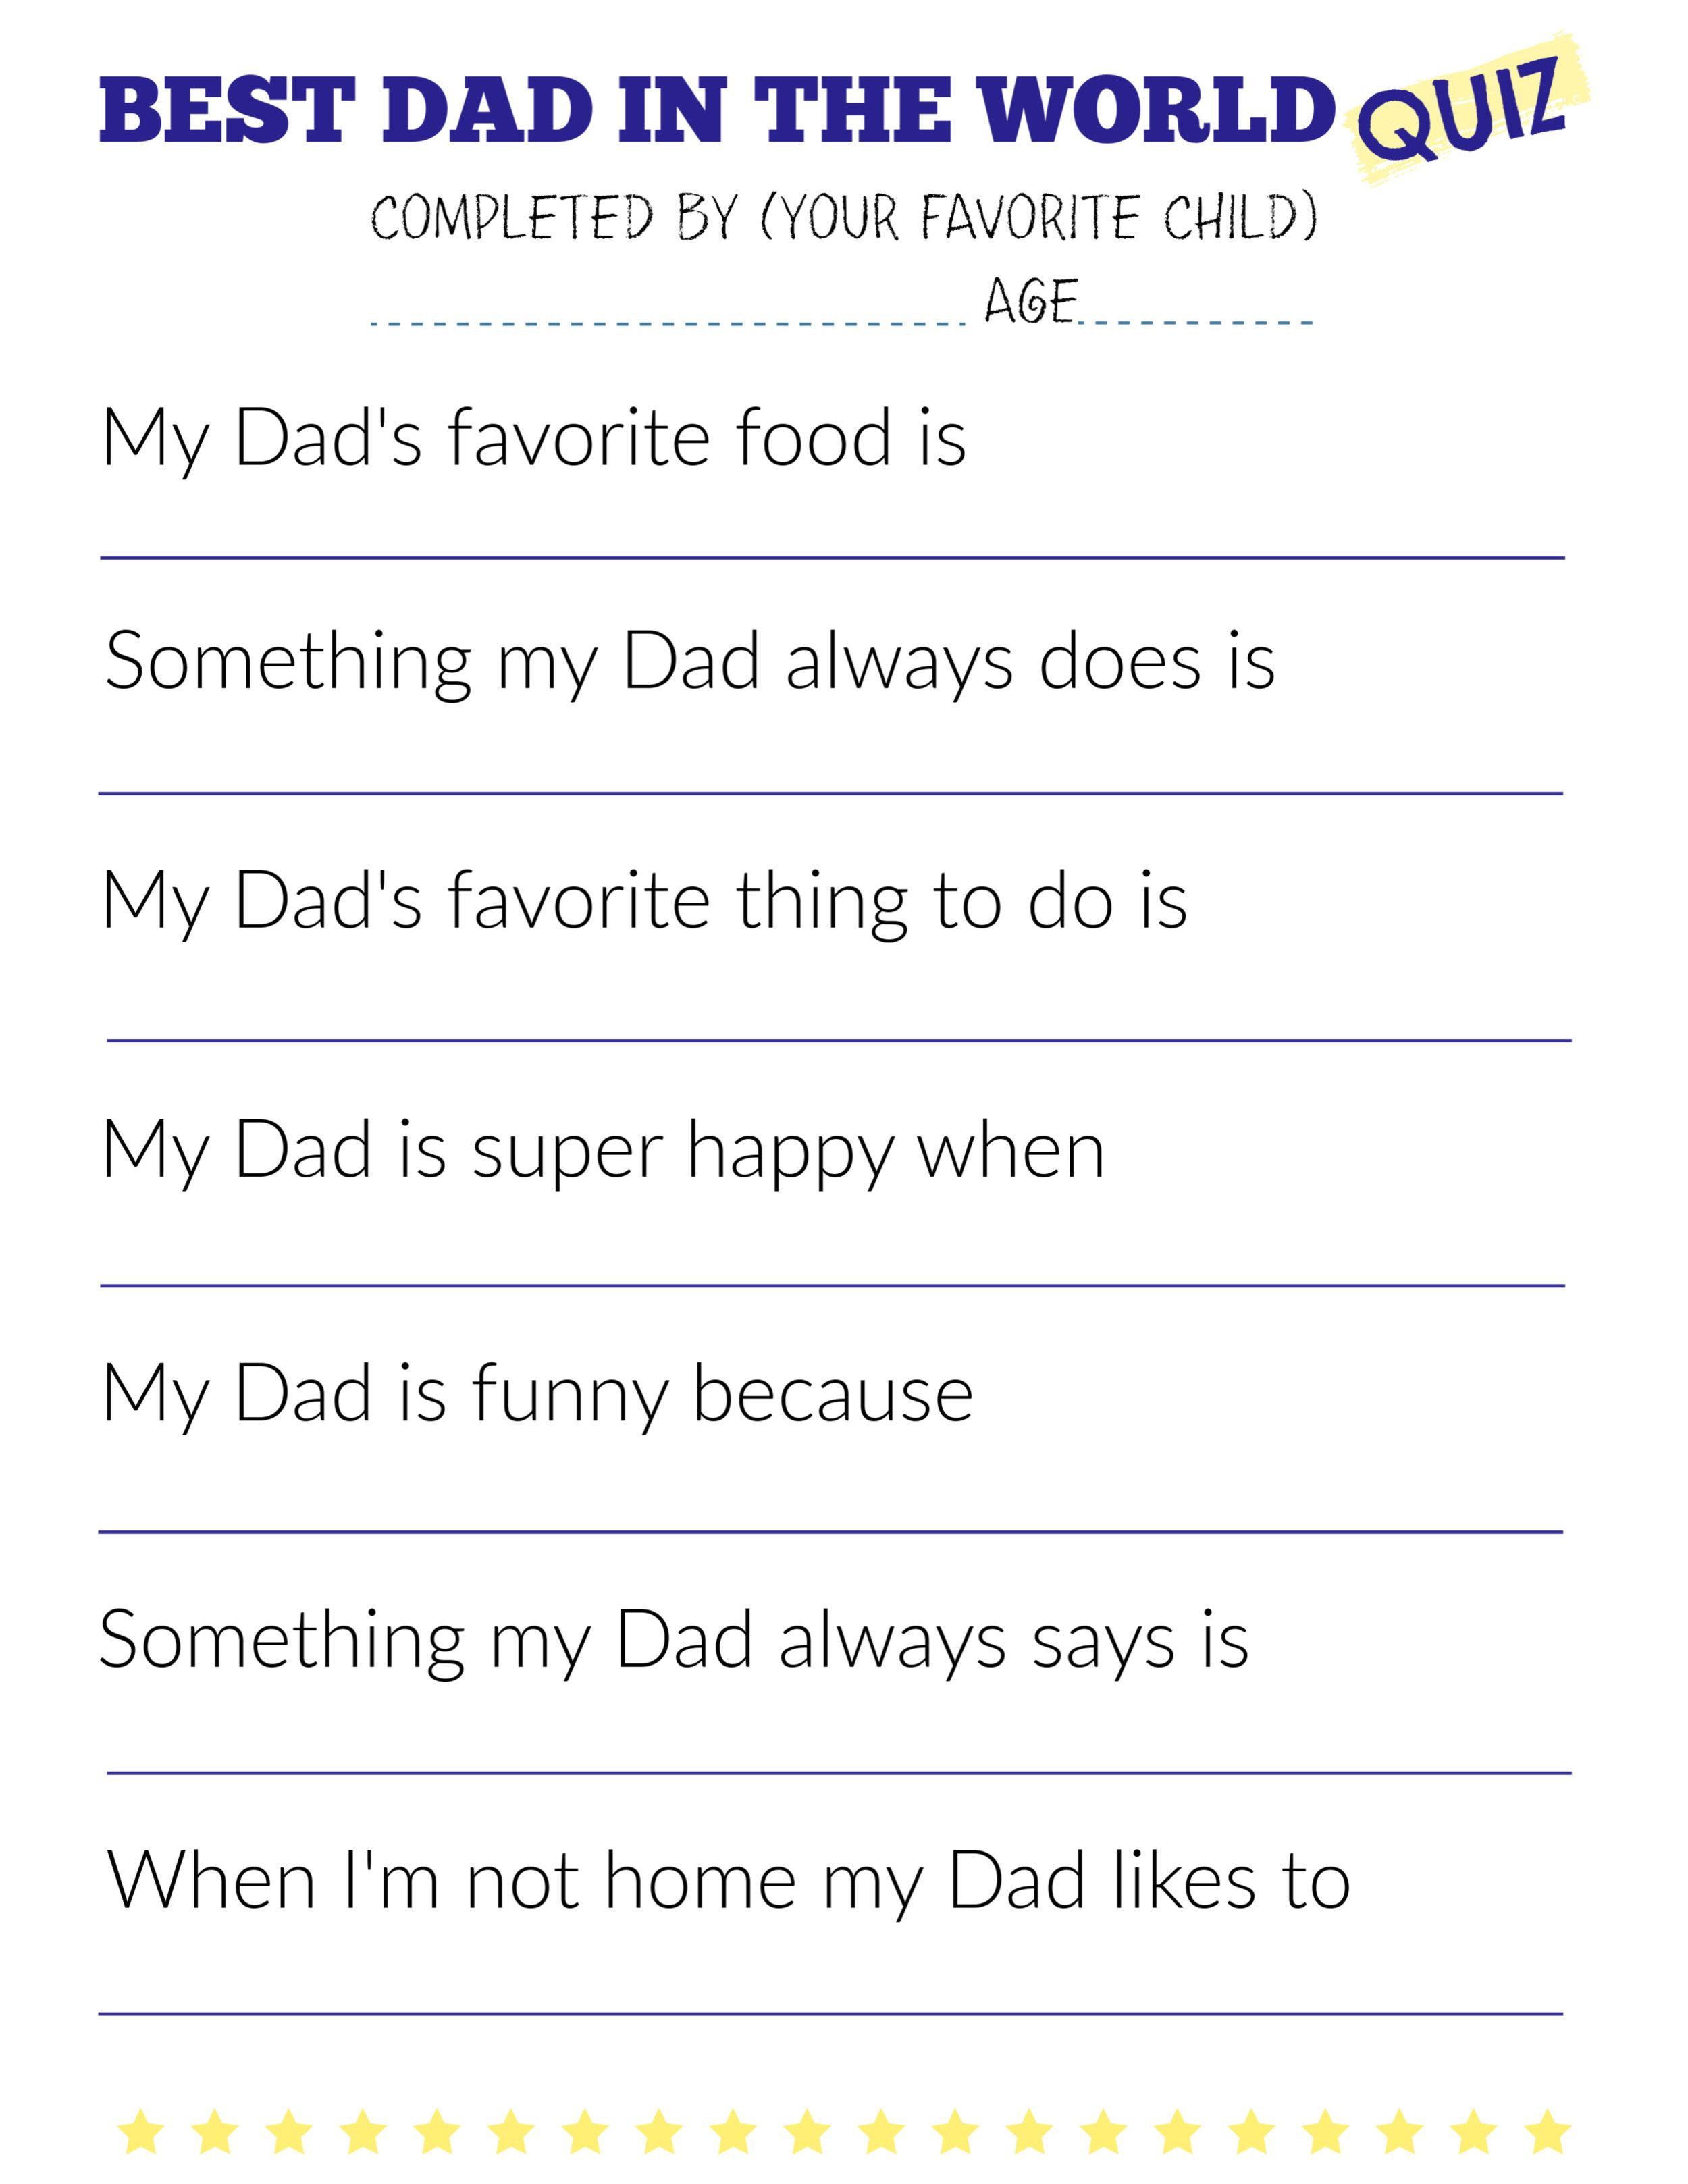 Fathers_Day_Quiz.jpg